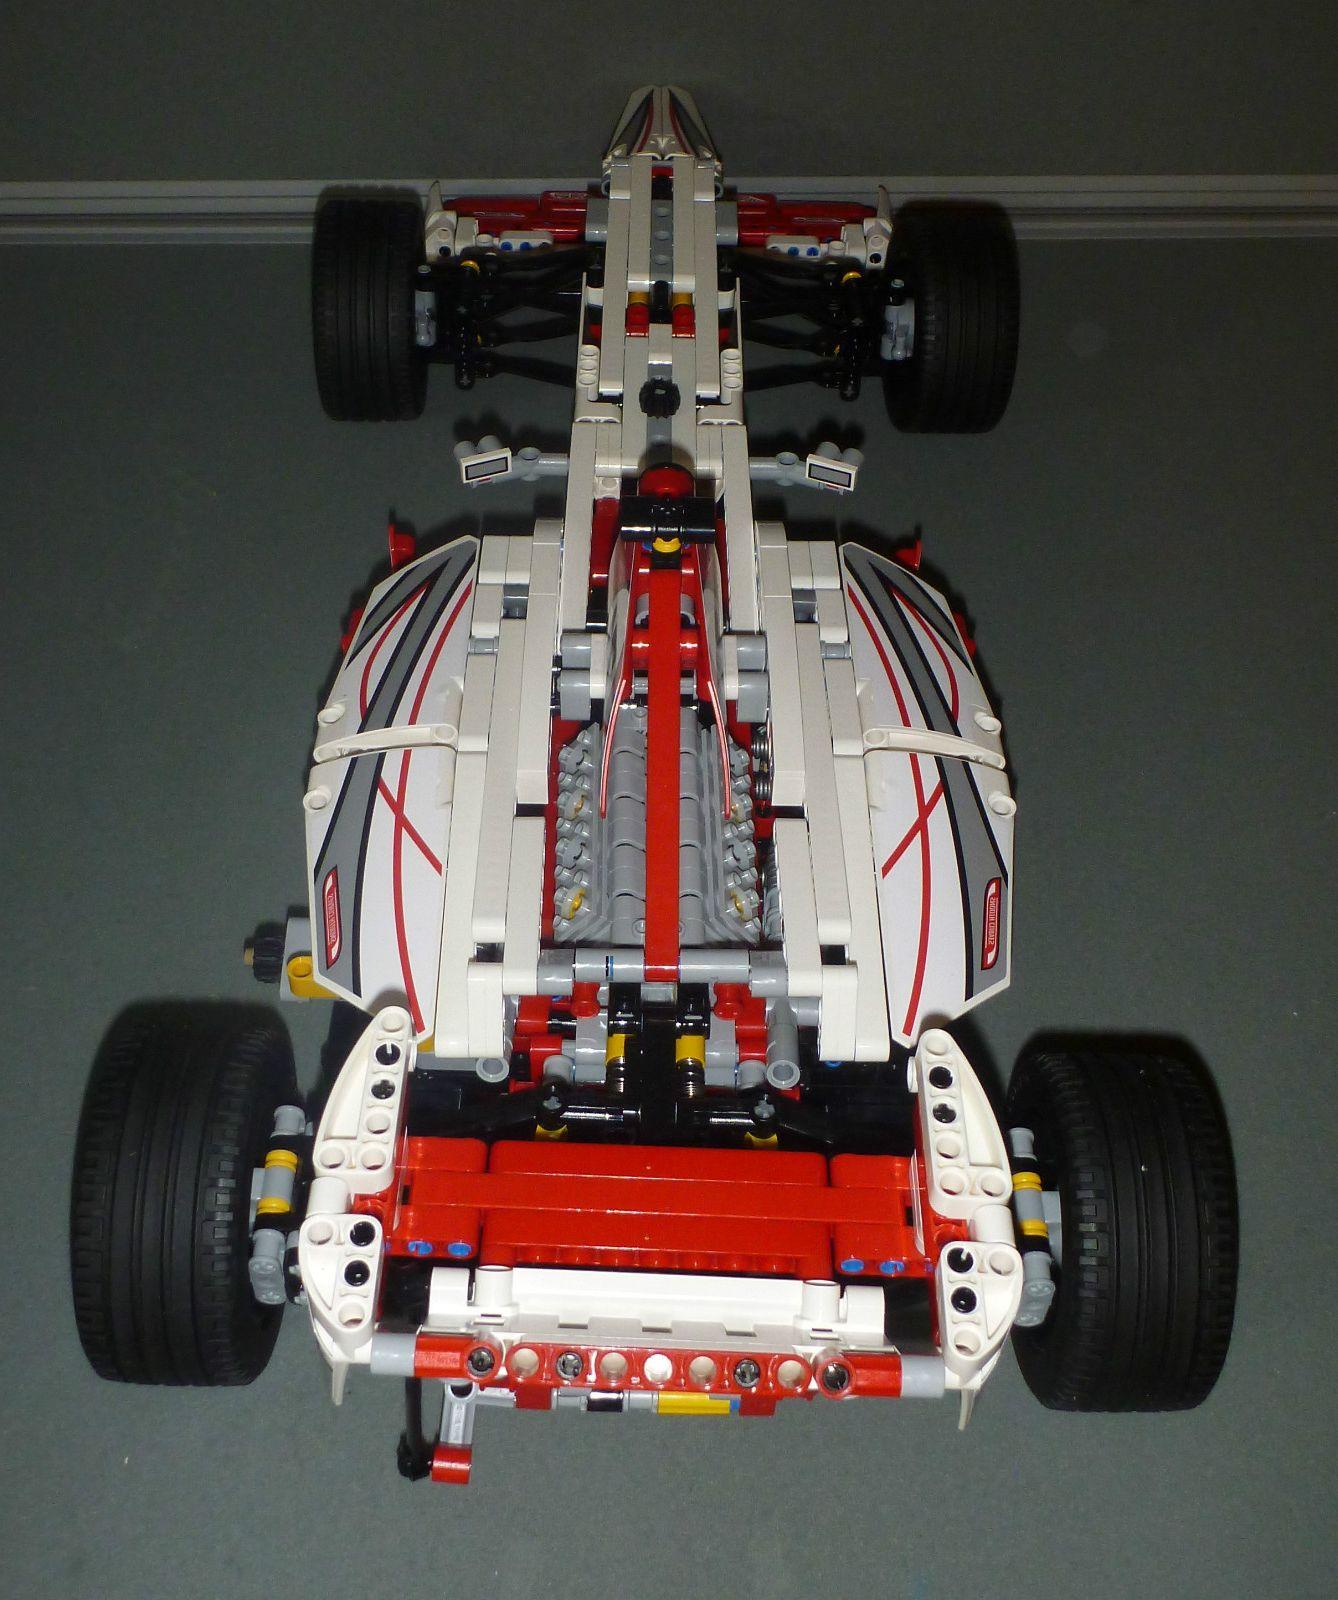 lego 42000 grand prix racer - photo #11